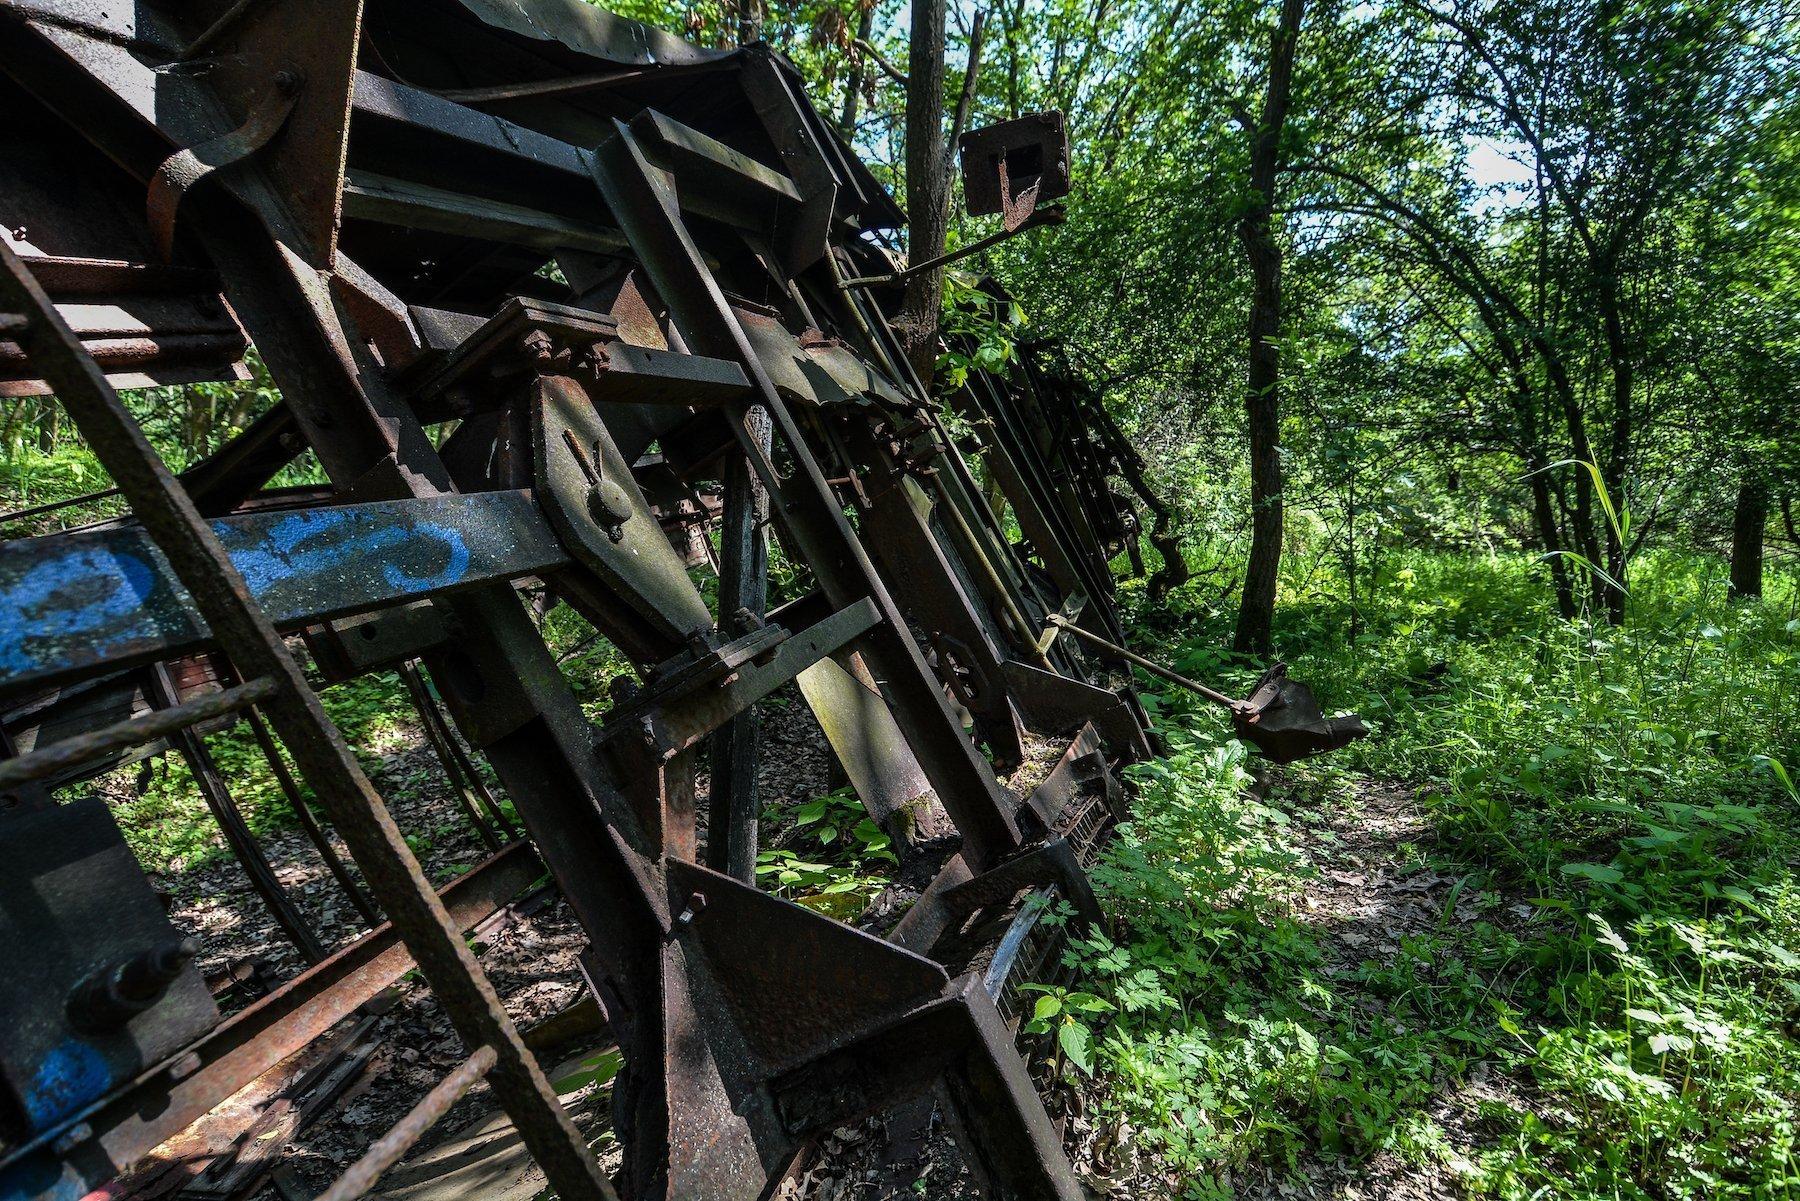 rusting abandoned tram strassenbahn brandenburg dallgow doeberitz potsdam abandoned urbex lost places germany deutschland